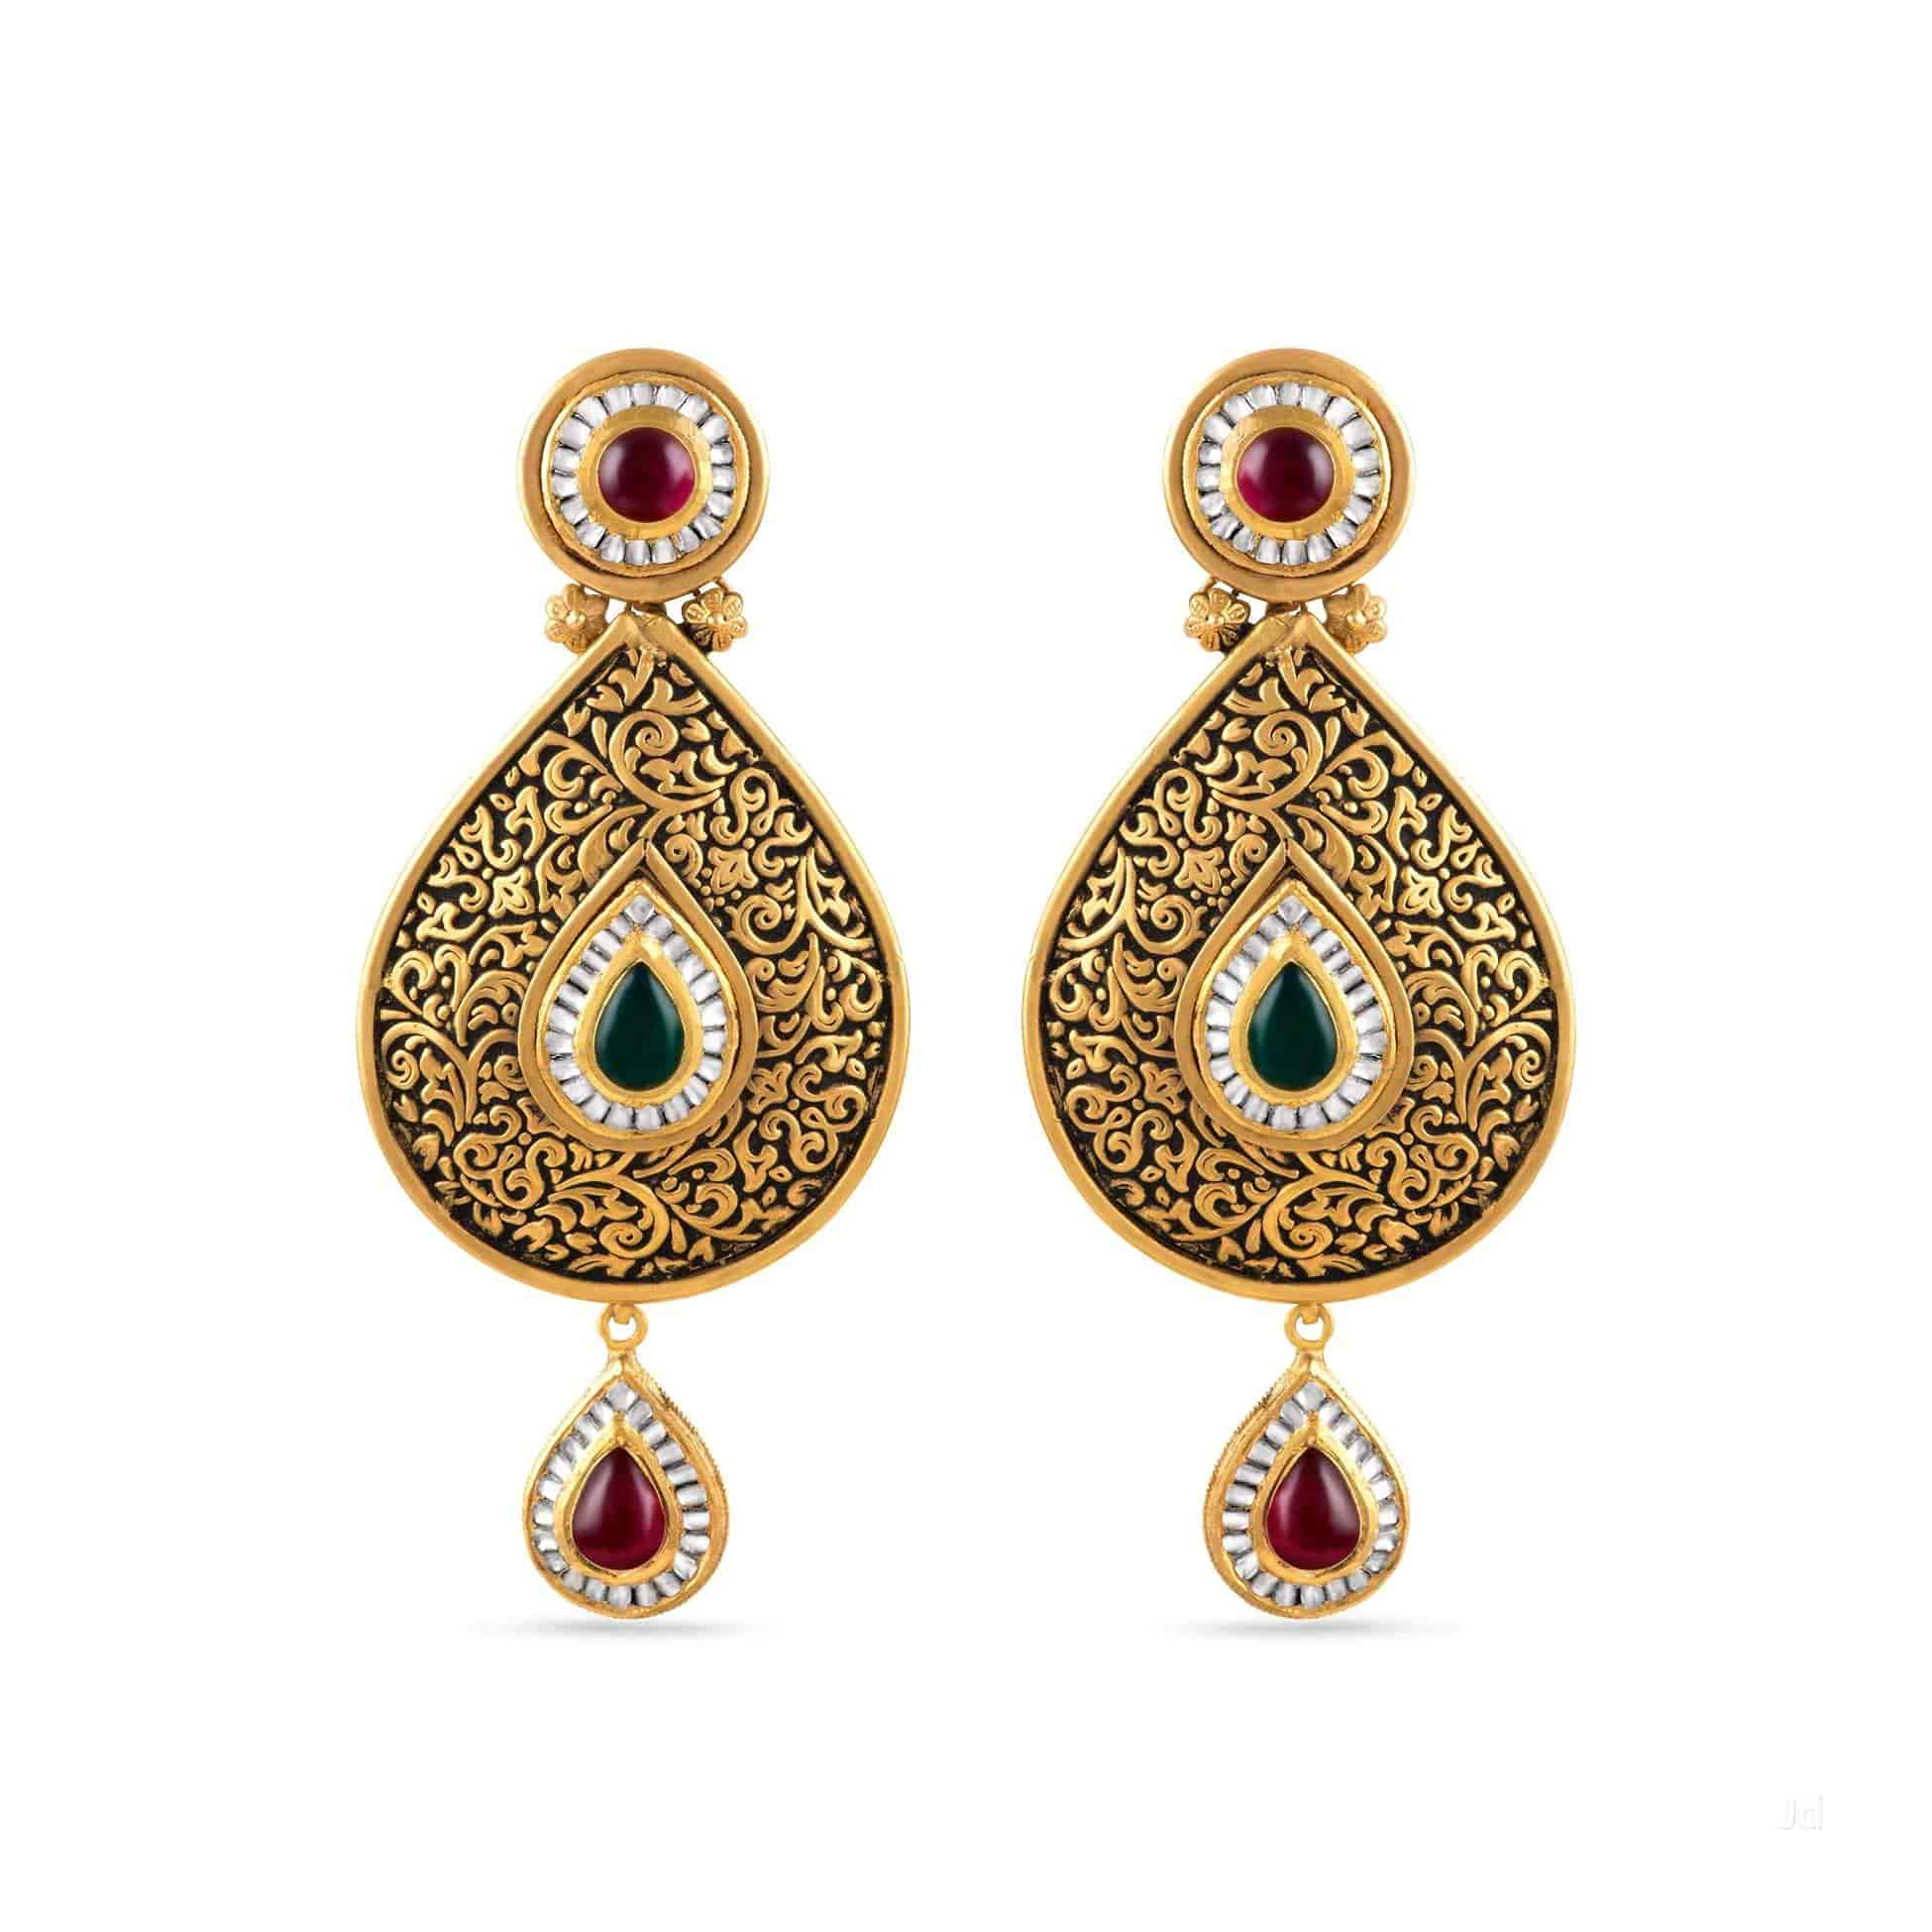 Indian Gem Jewellery Creation Pvt Ltd South City Mall Photos Jodhpur Park